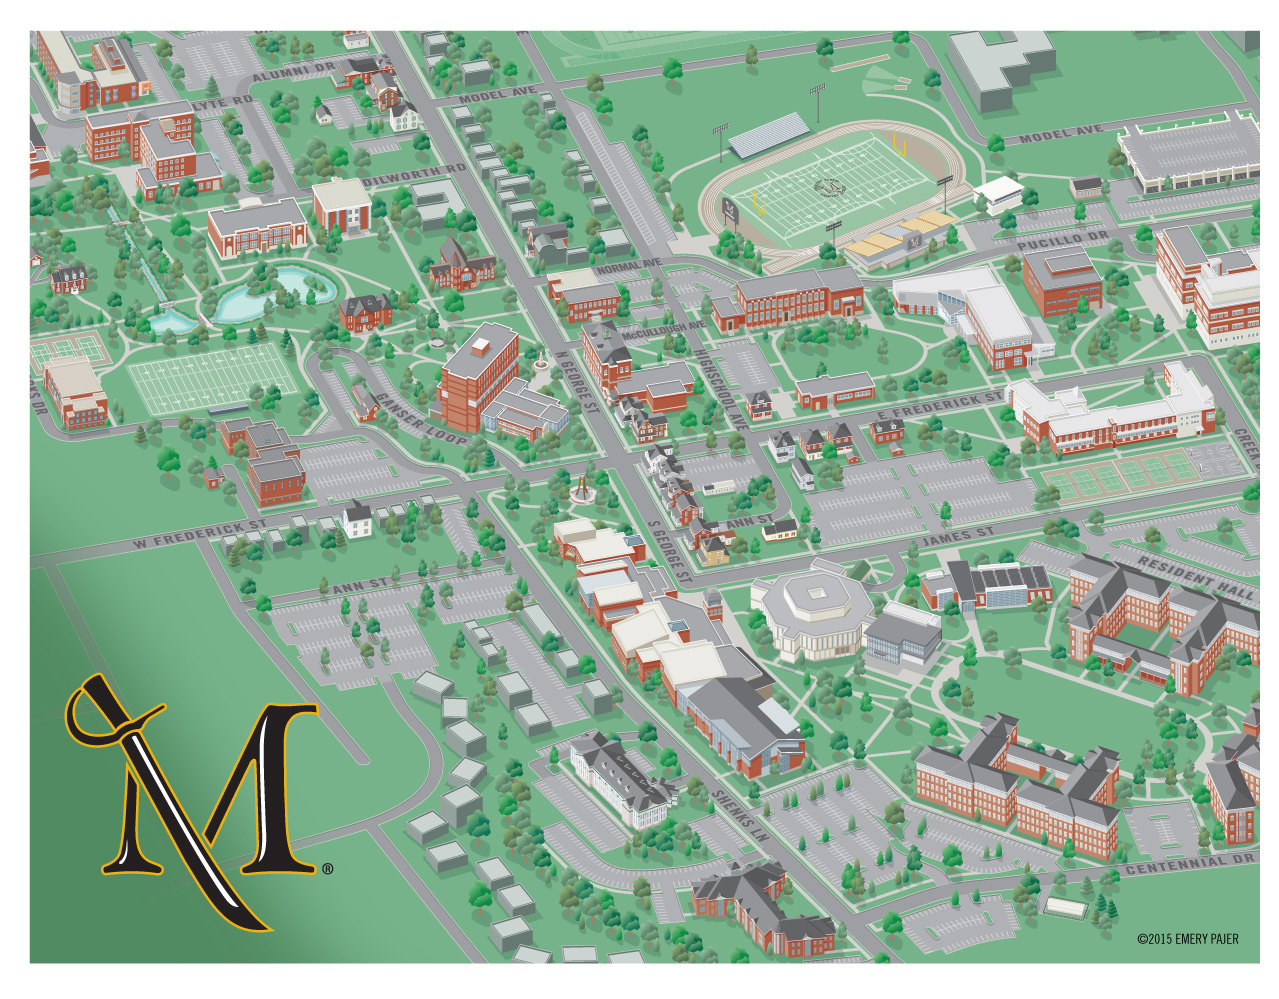 Millersville Campus Map City & College Campus Map Illustration & Design Millersville Campus Map